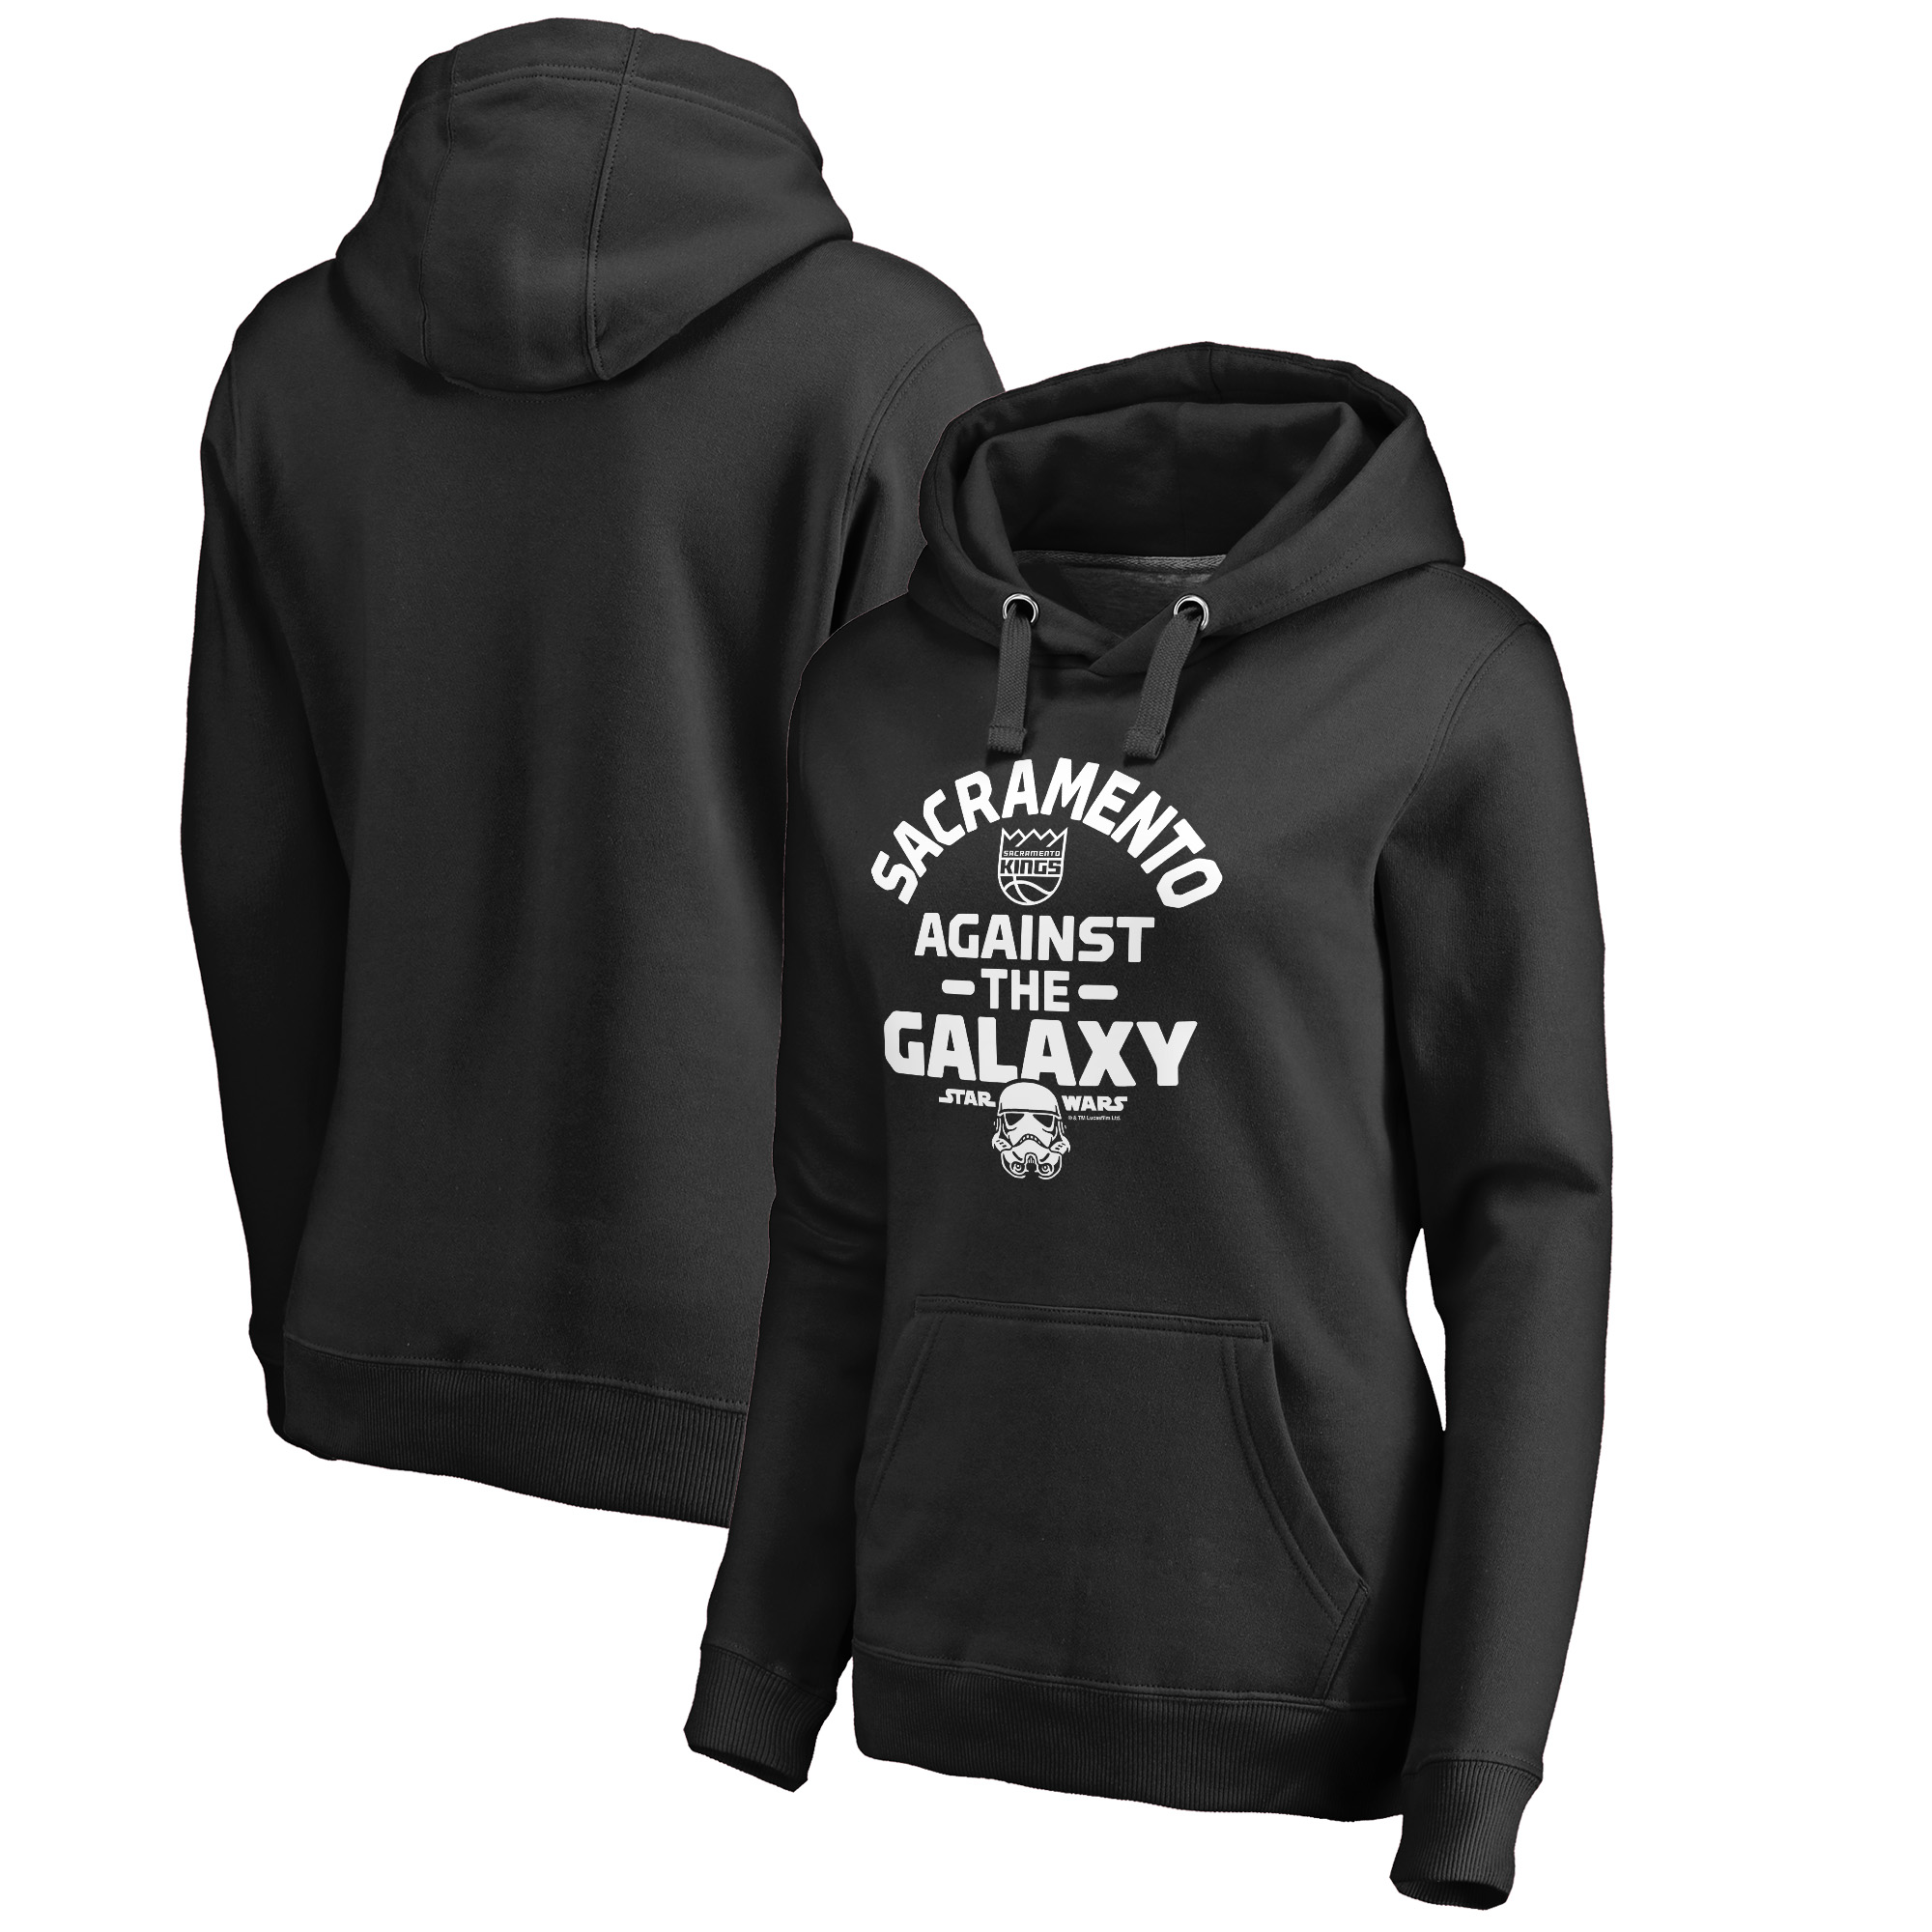 Sacramento Kings Fanatics Branded Women's Star Wars Against the Galaxy Pullover Hoodie - Black